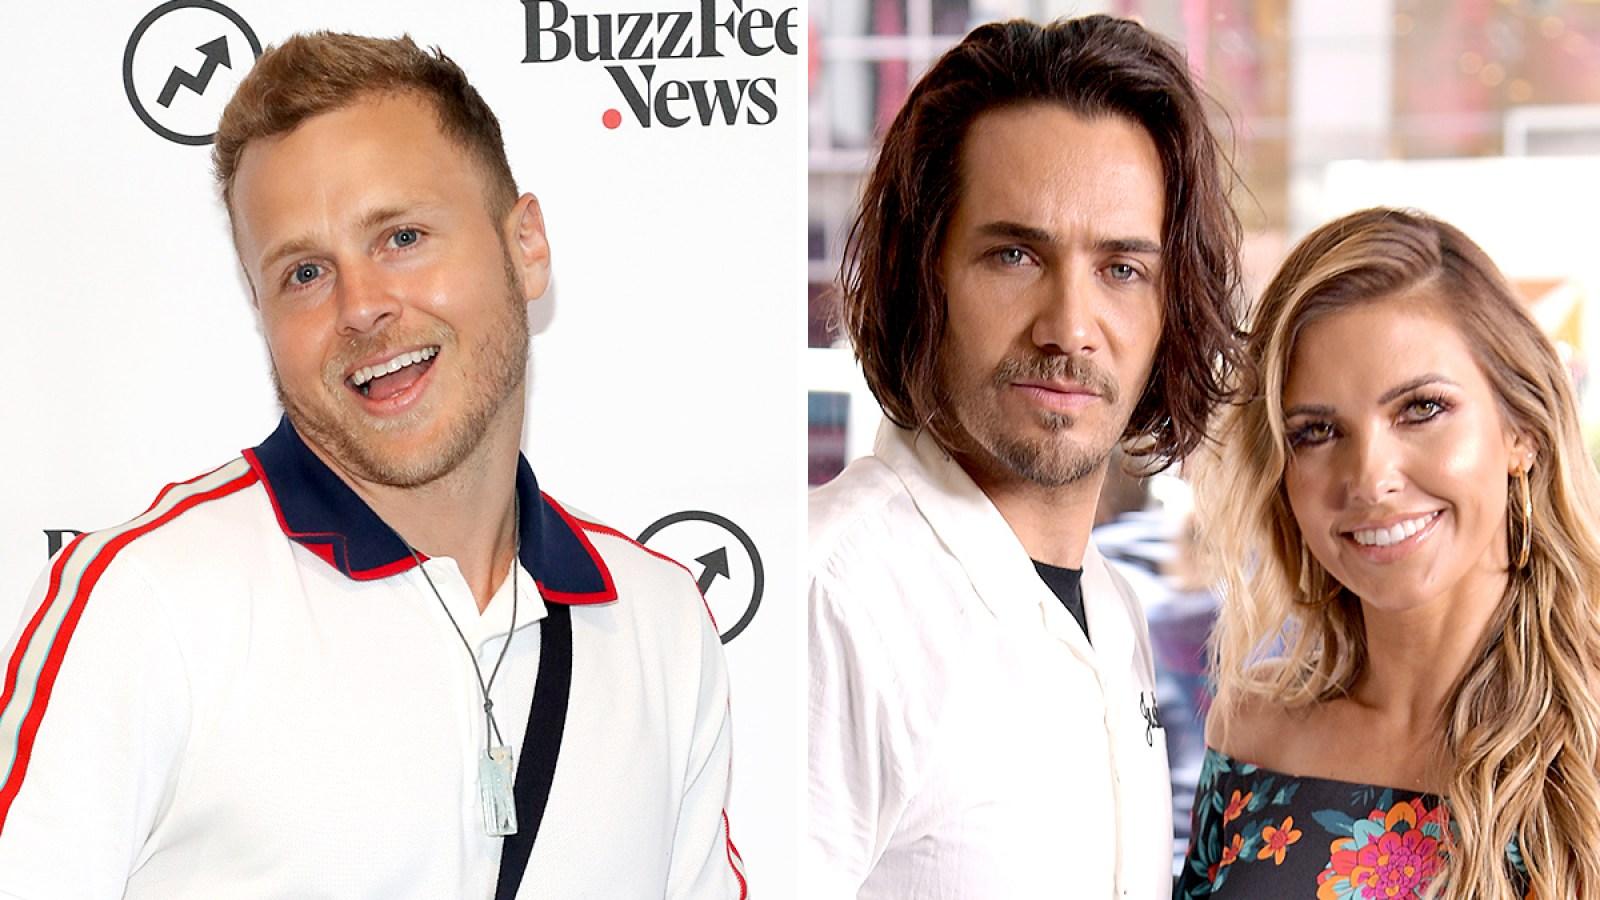 Spencer Pratt: Is Justin Bobby the Father of Audrina Patridge's Baby?